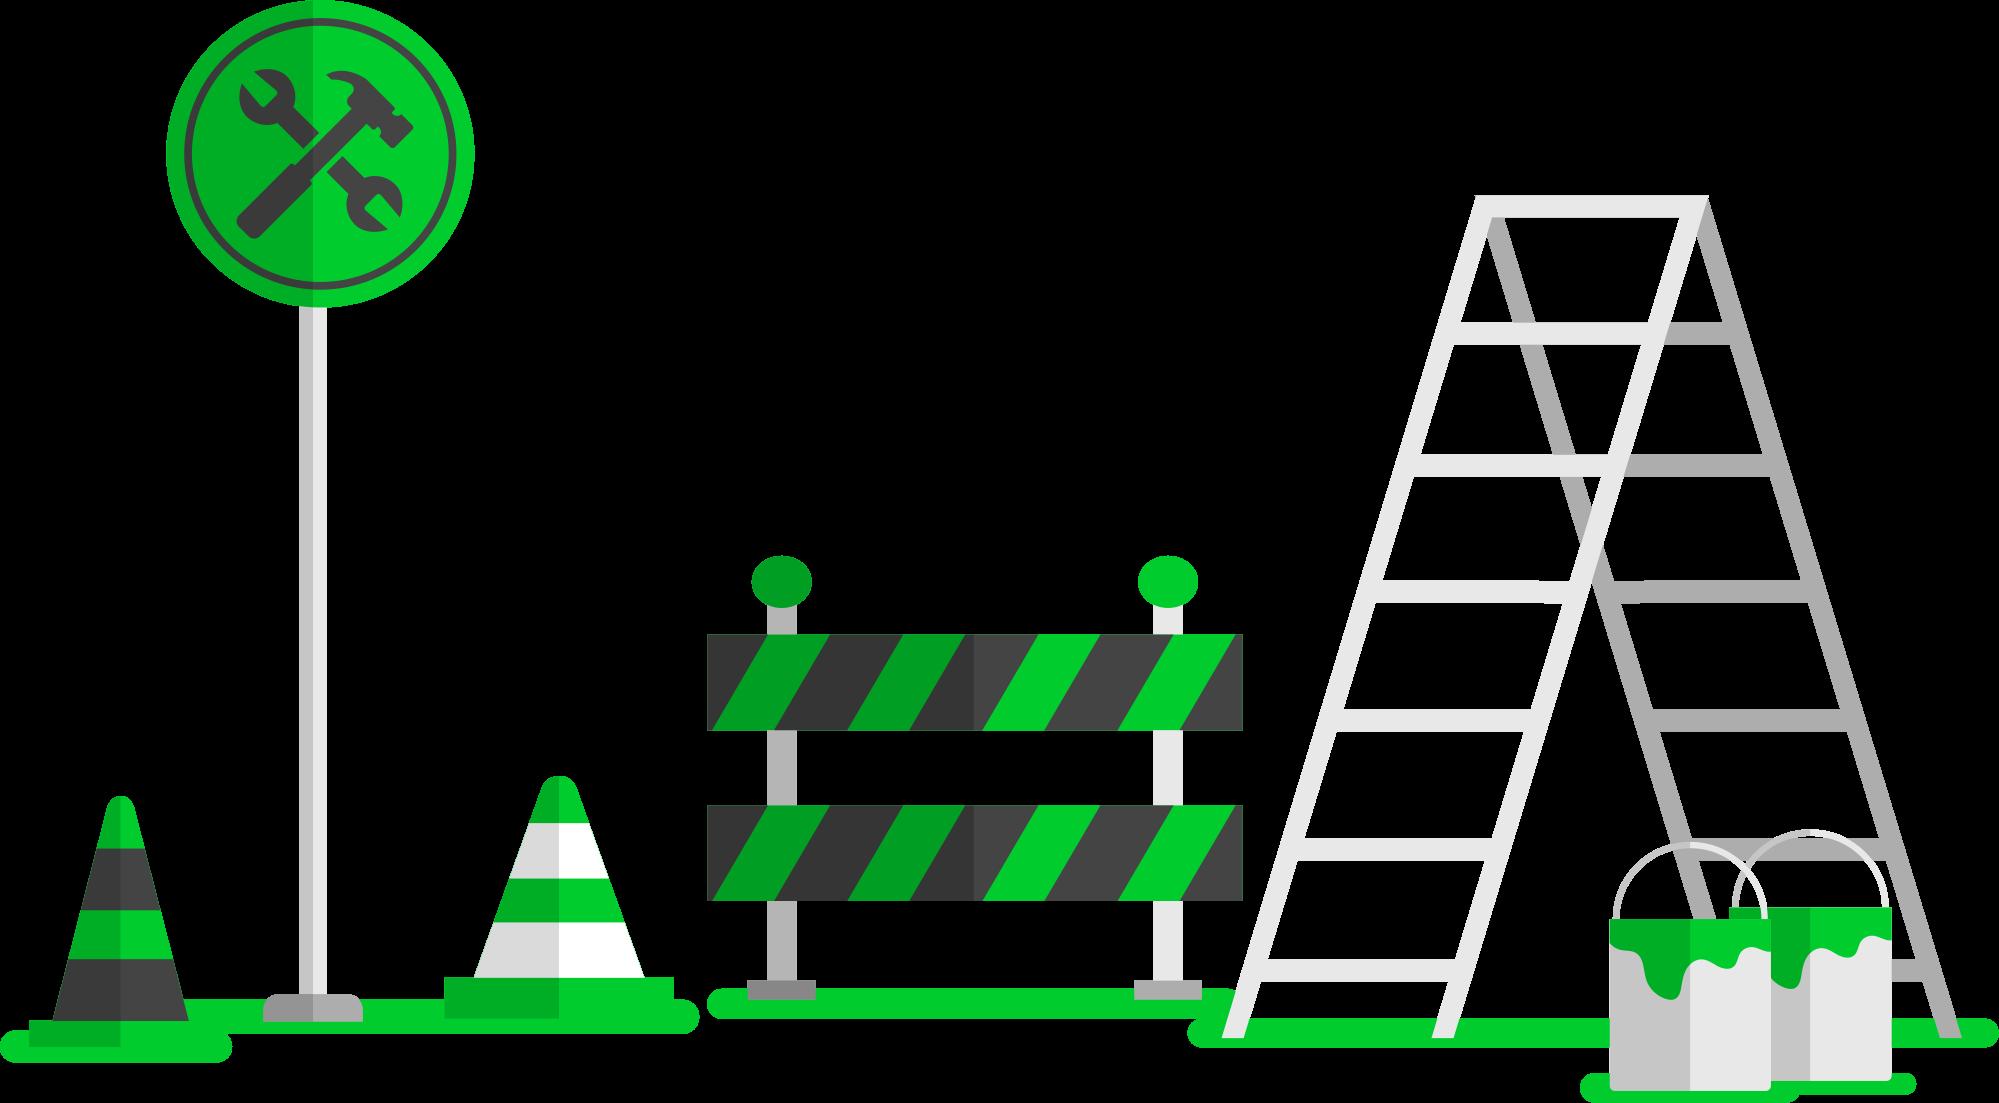 Baustelle wegen websiteumbau